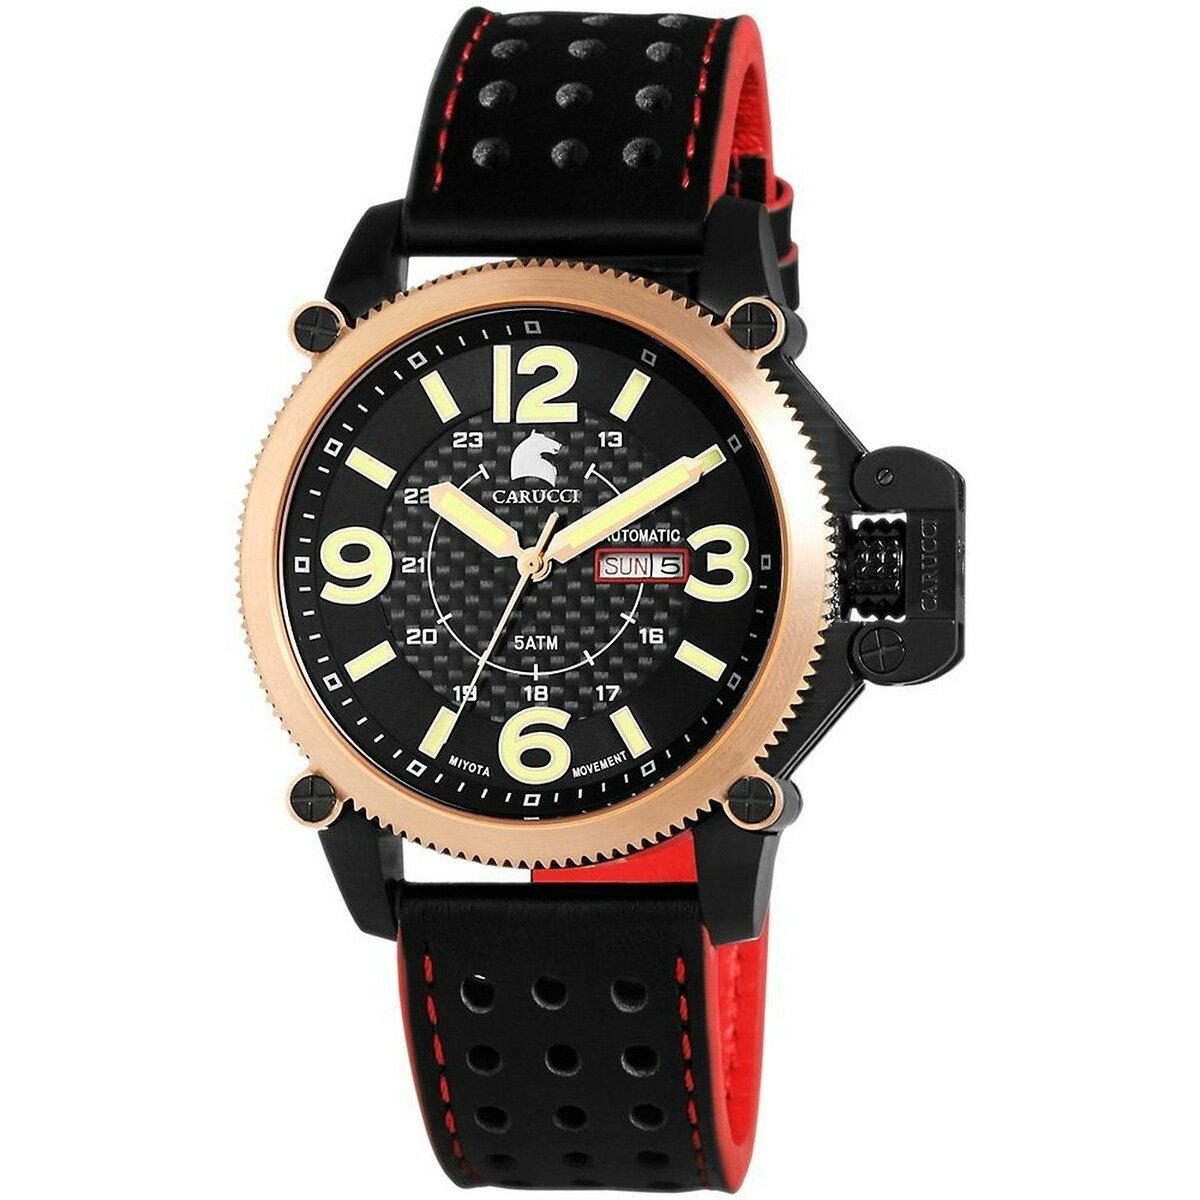 Carucci カルッチ 自動巻き 腕時計 メンズ [CA2191RG] 並行輸入品 メーカー国際保証24ヵ月 純正ケース付き メンズウォッチ海外 個性派 腕時計/パワーリザーブ